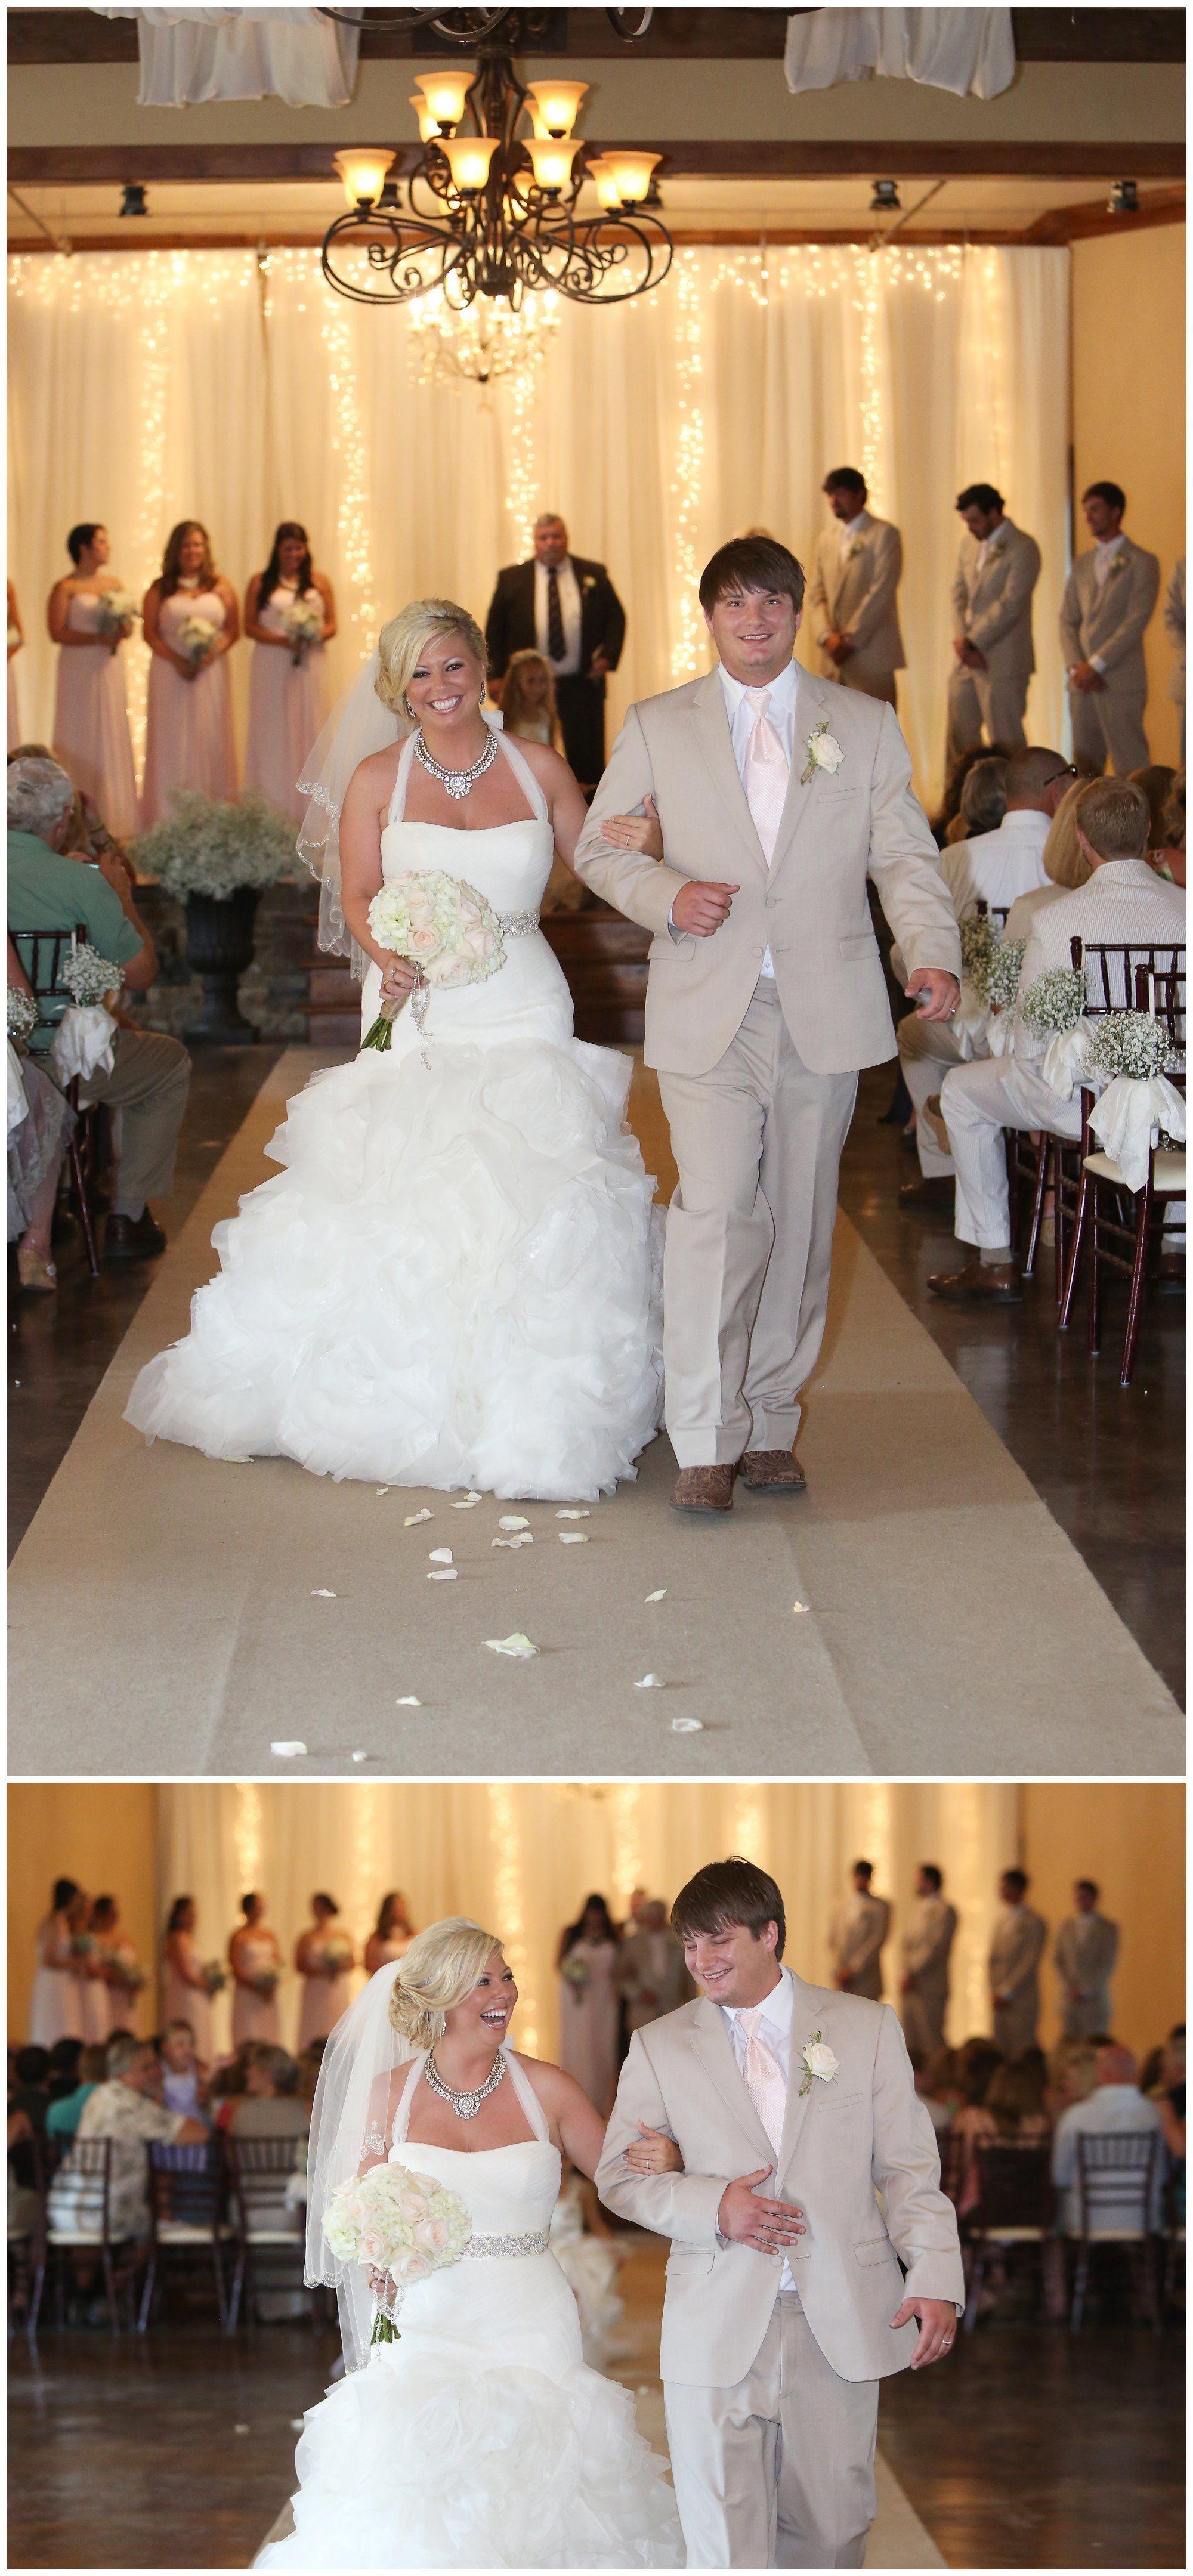 Wedding dress huntsville al  North Alabama Wedding Photography  Stone Bridge Farms Cullman AL